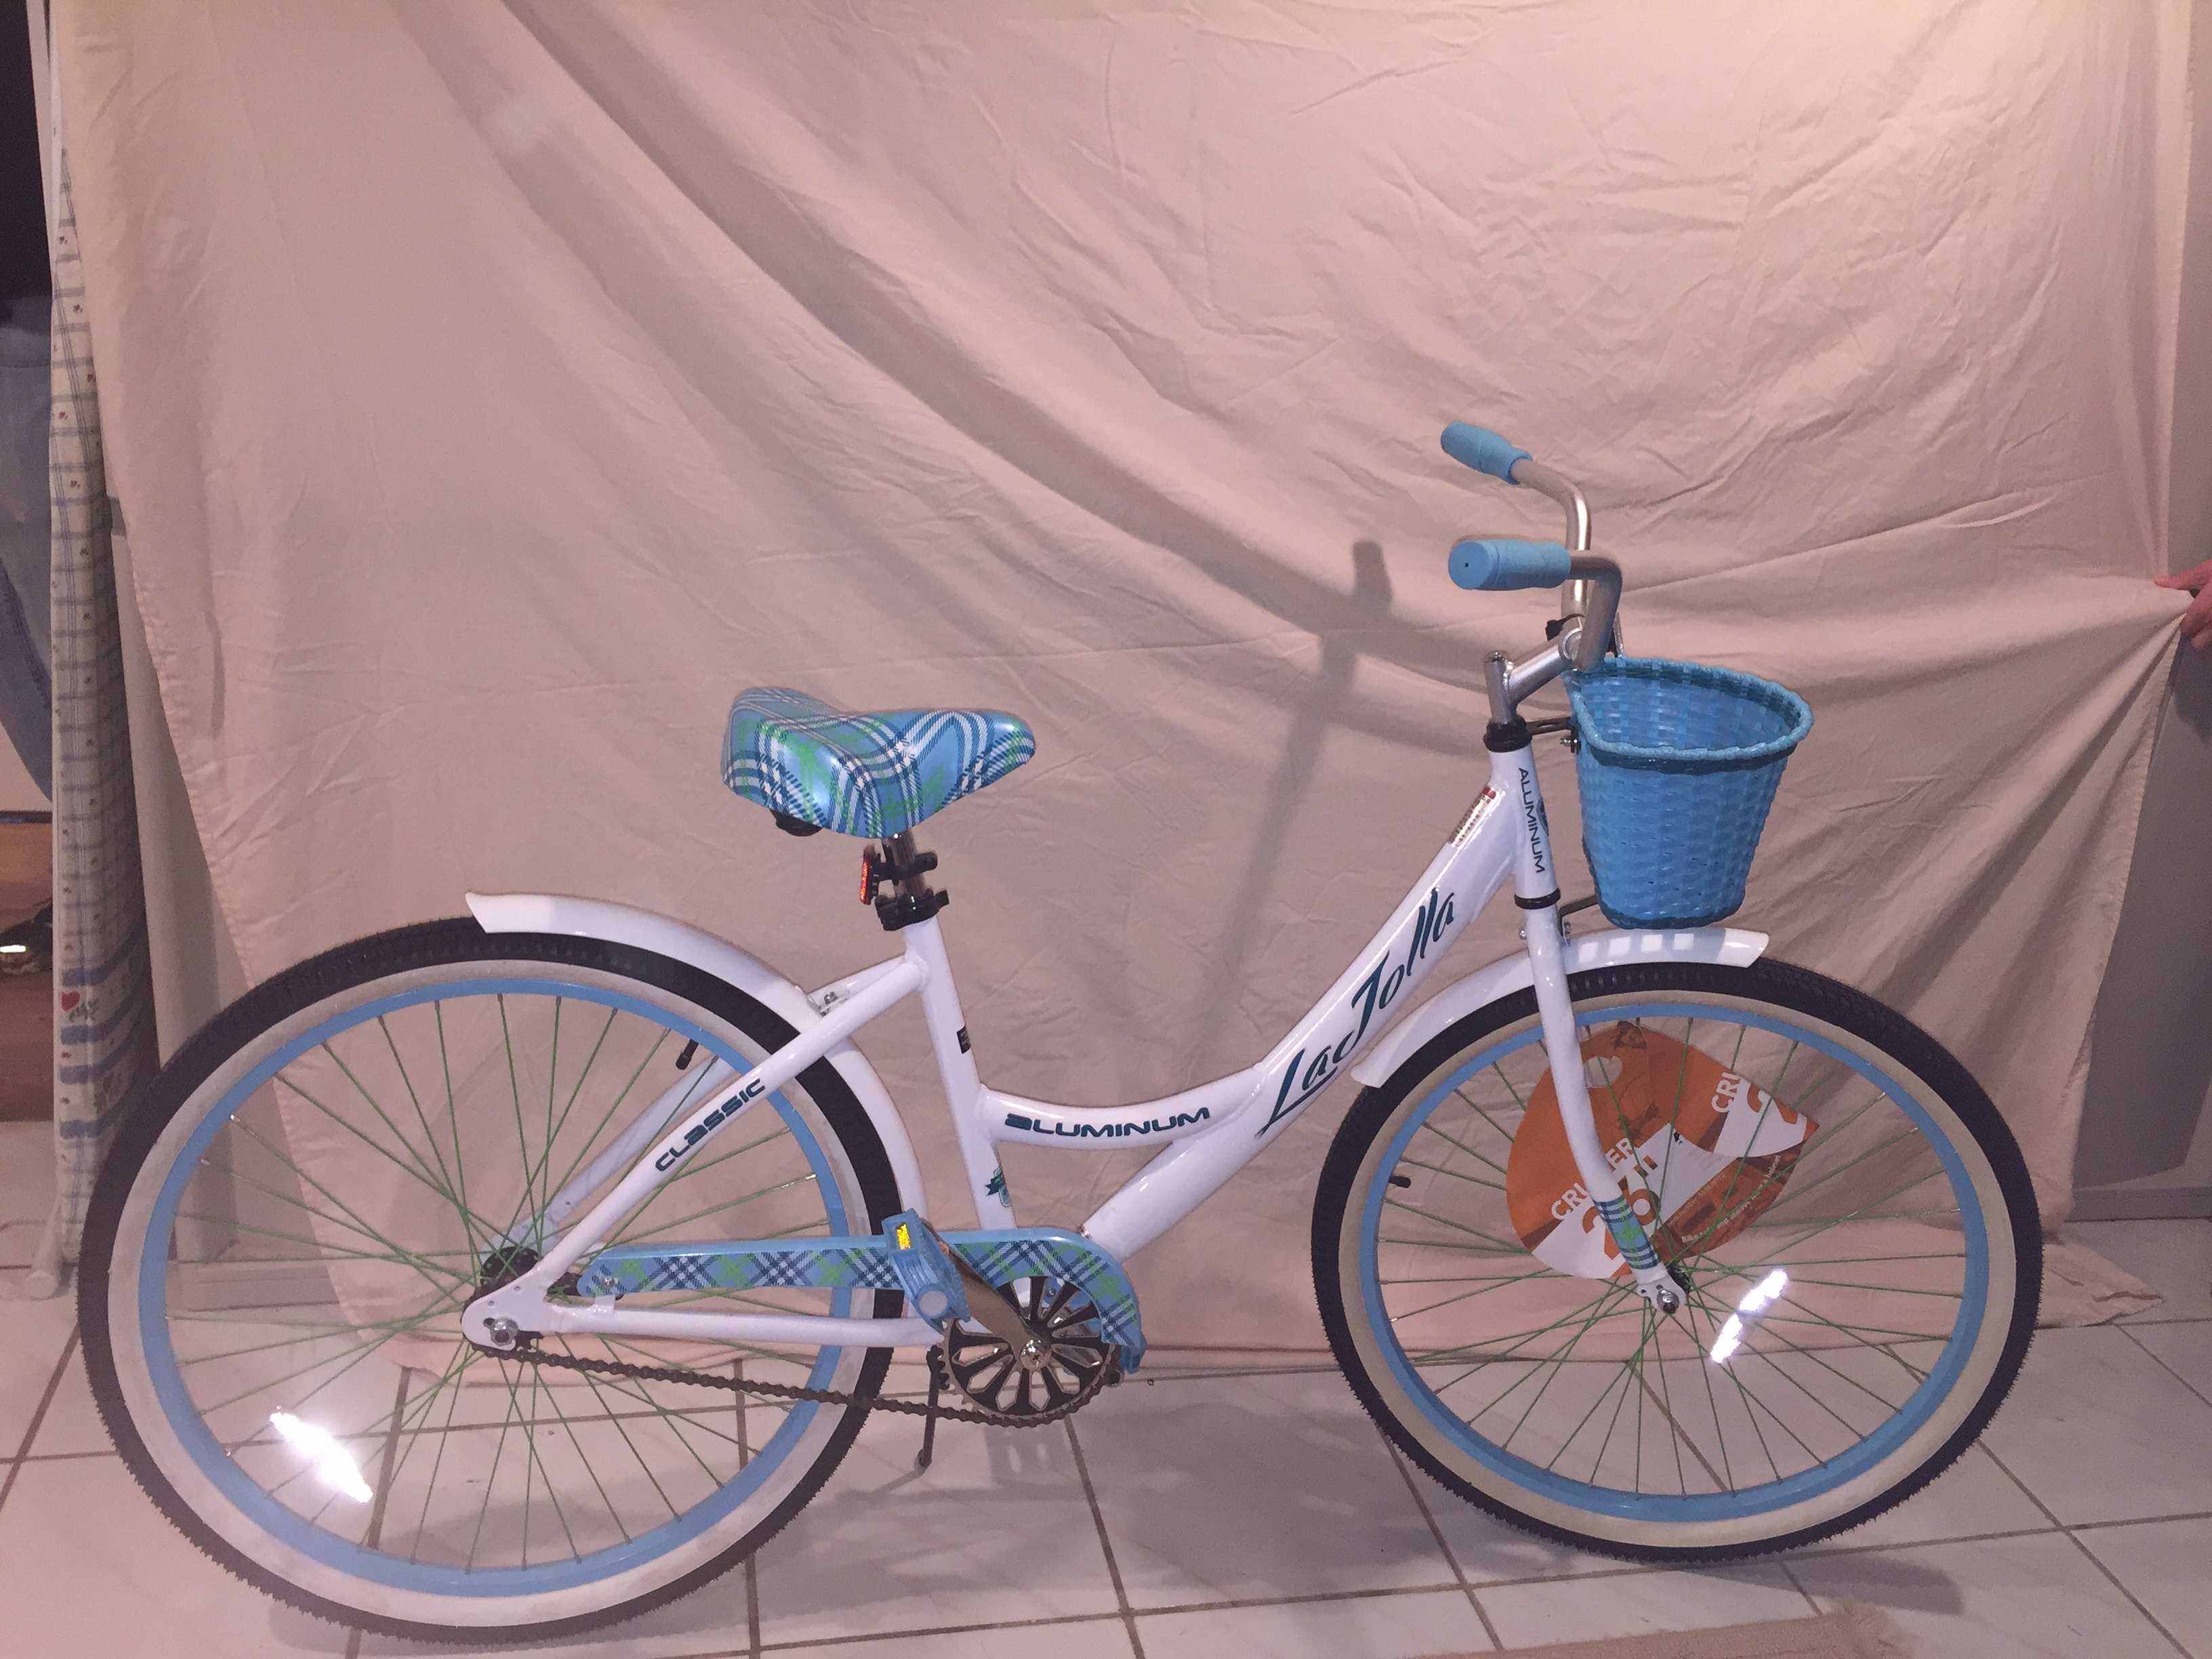 d78ca48e5e502f617aad_biketcf.jpg